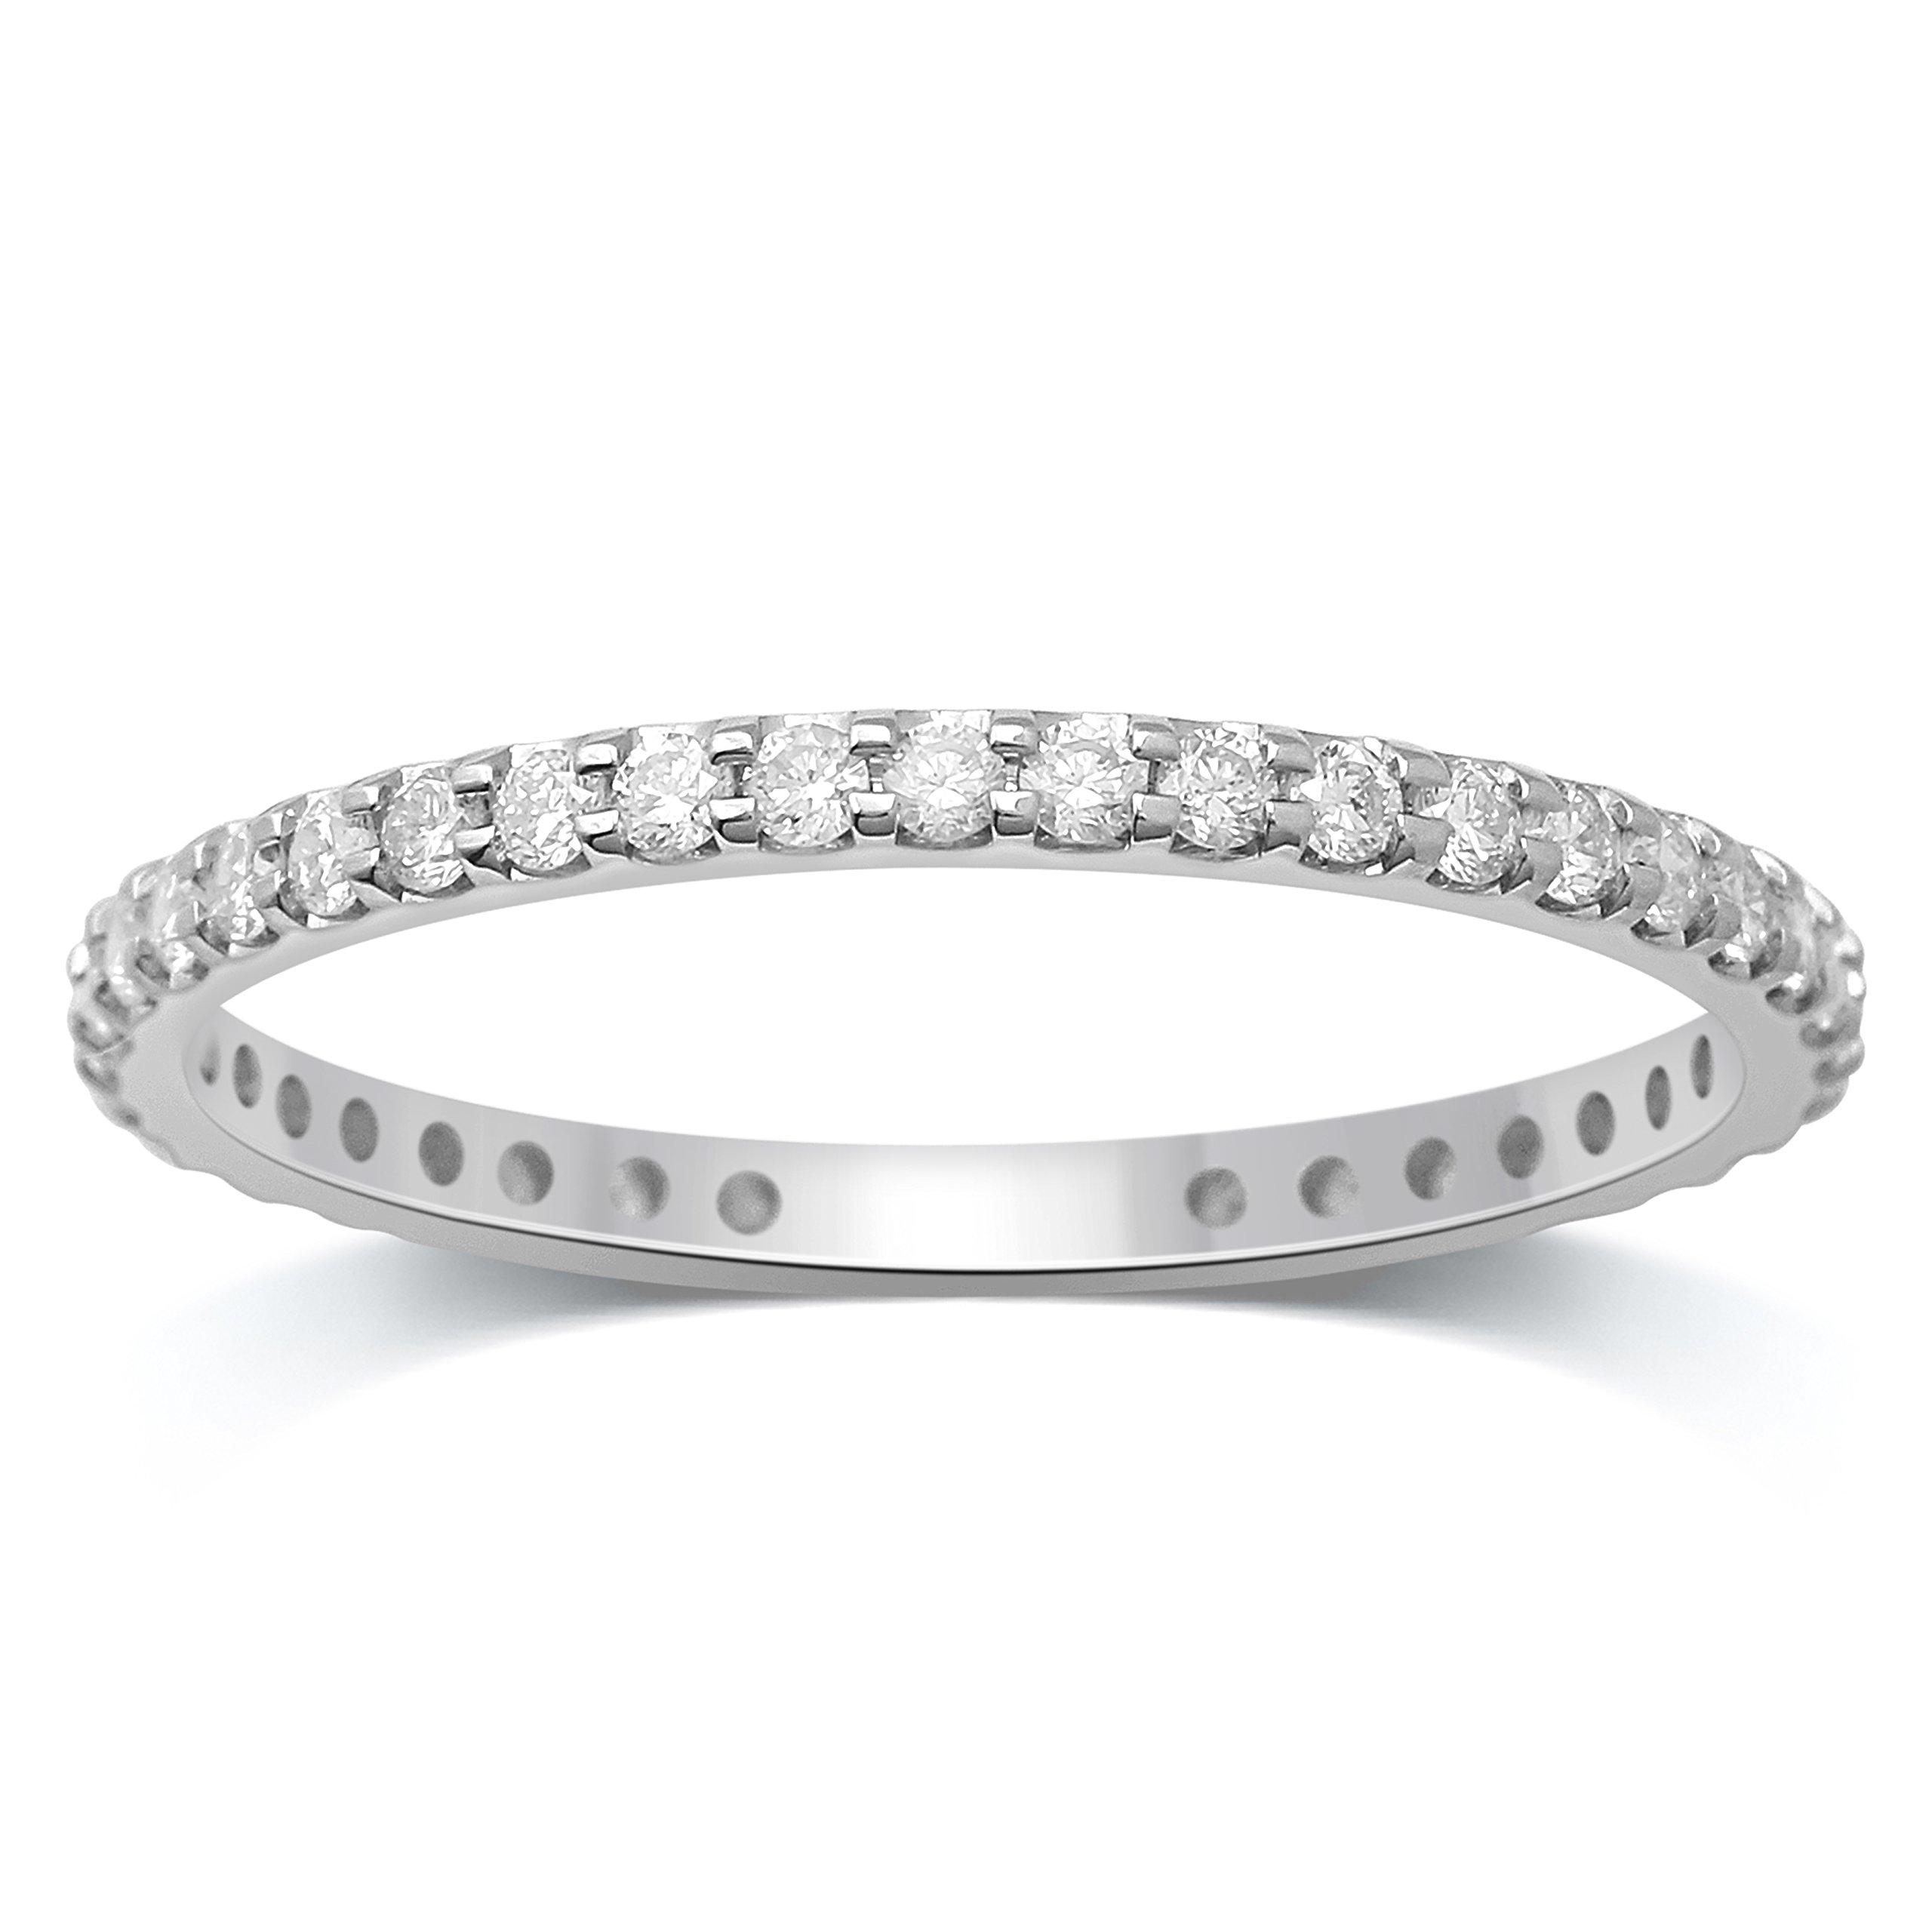 Diamond Jewel 14K White Gold 1/2 cttw Diamond (H-I Color, I1 Clarity) Prong Set Eternity Band